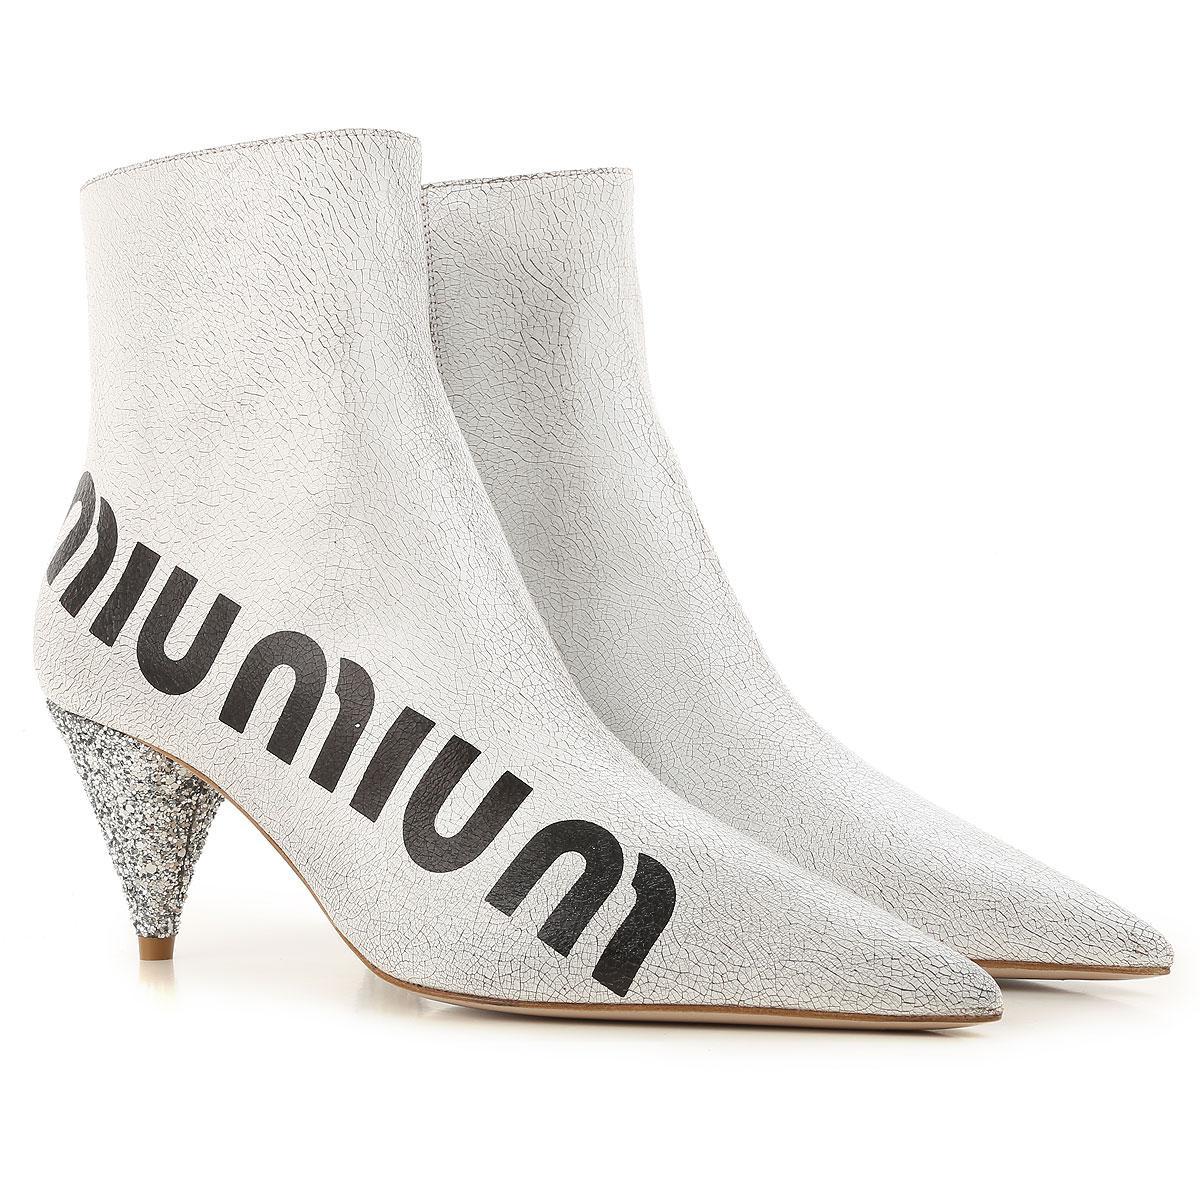 Miu Miu Boots For Women in White - Lyst